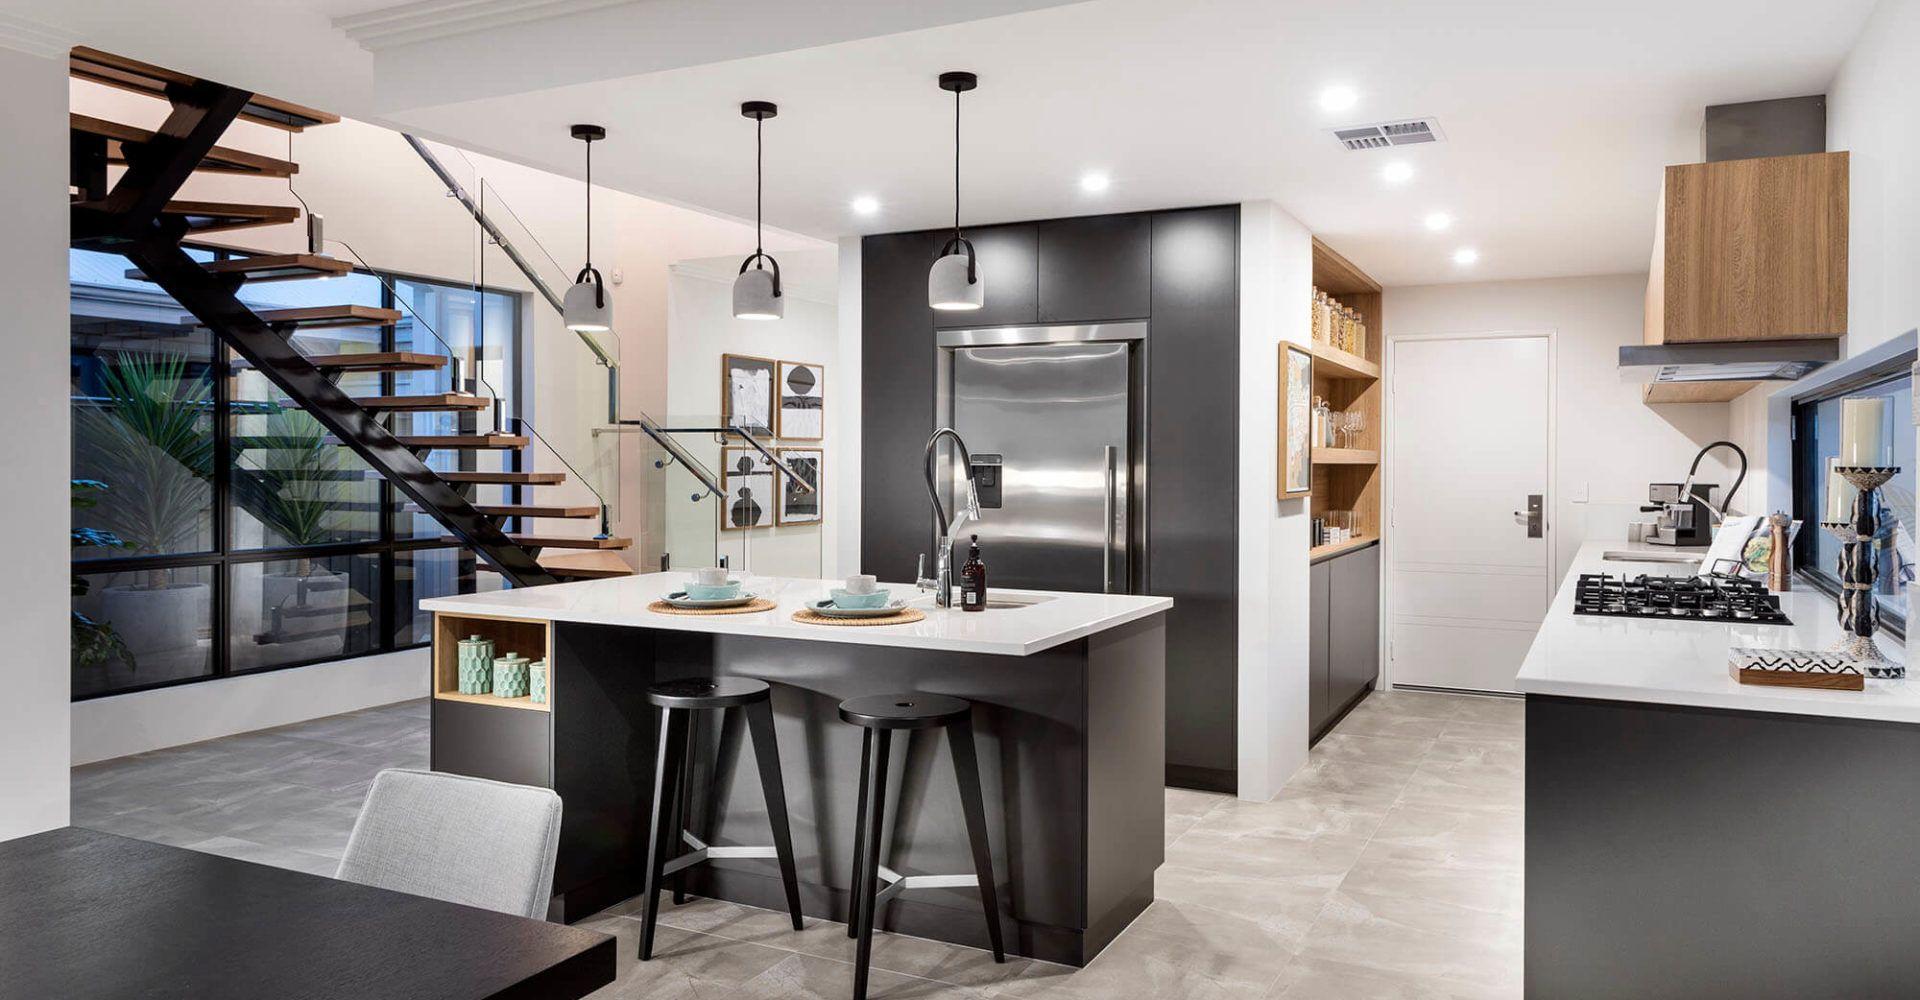 2 Storey House Interior Designs